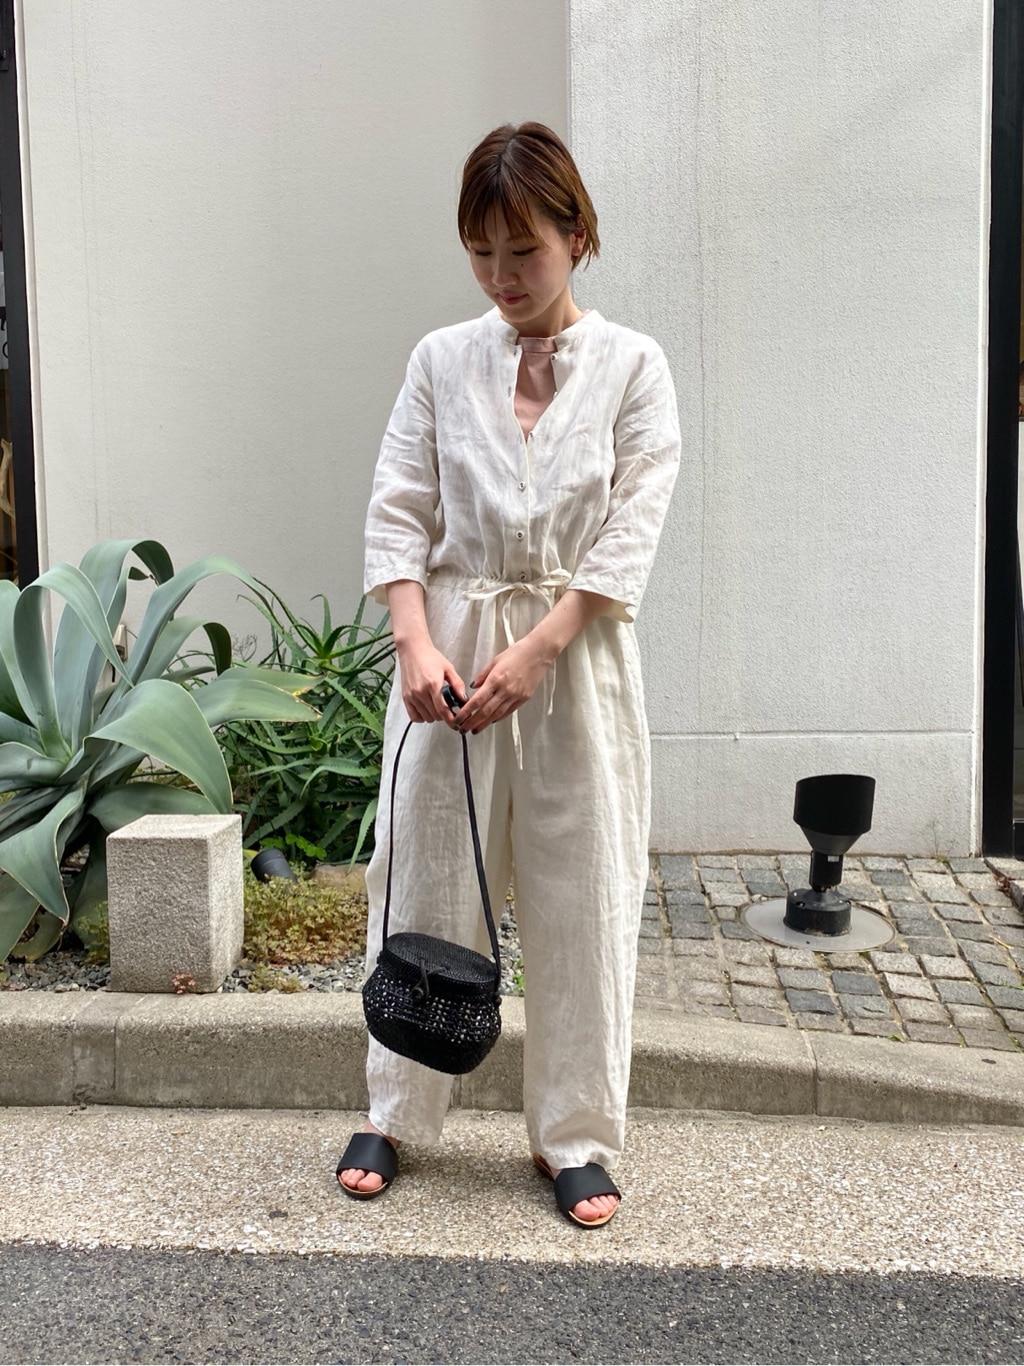 yuni 神戸路面 身長:155cm 2021.05.20